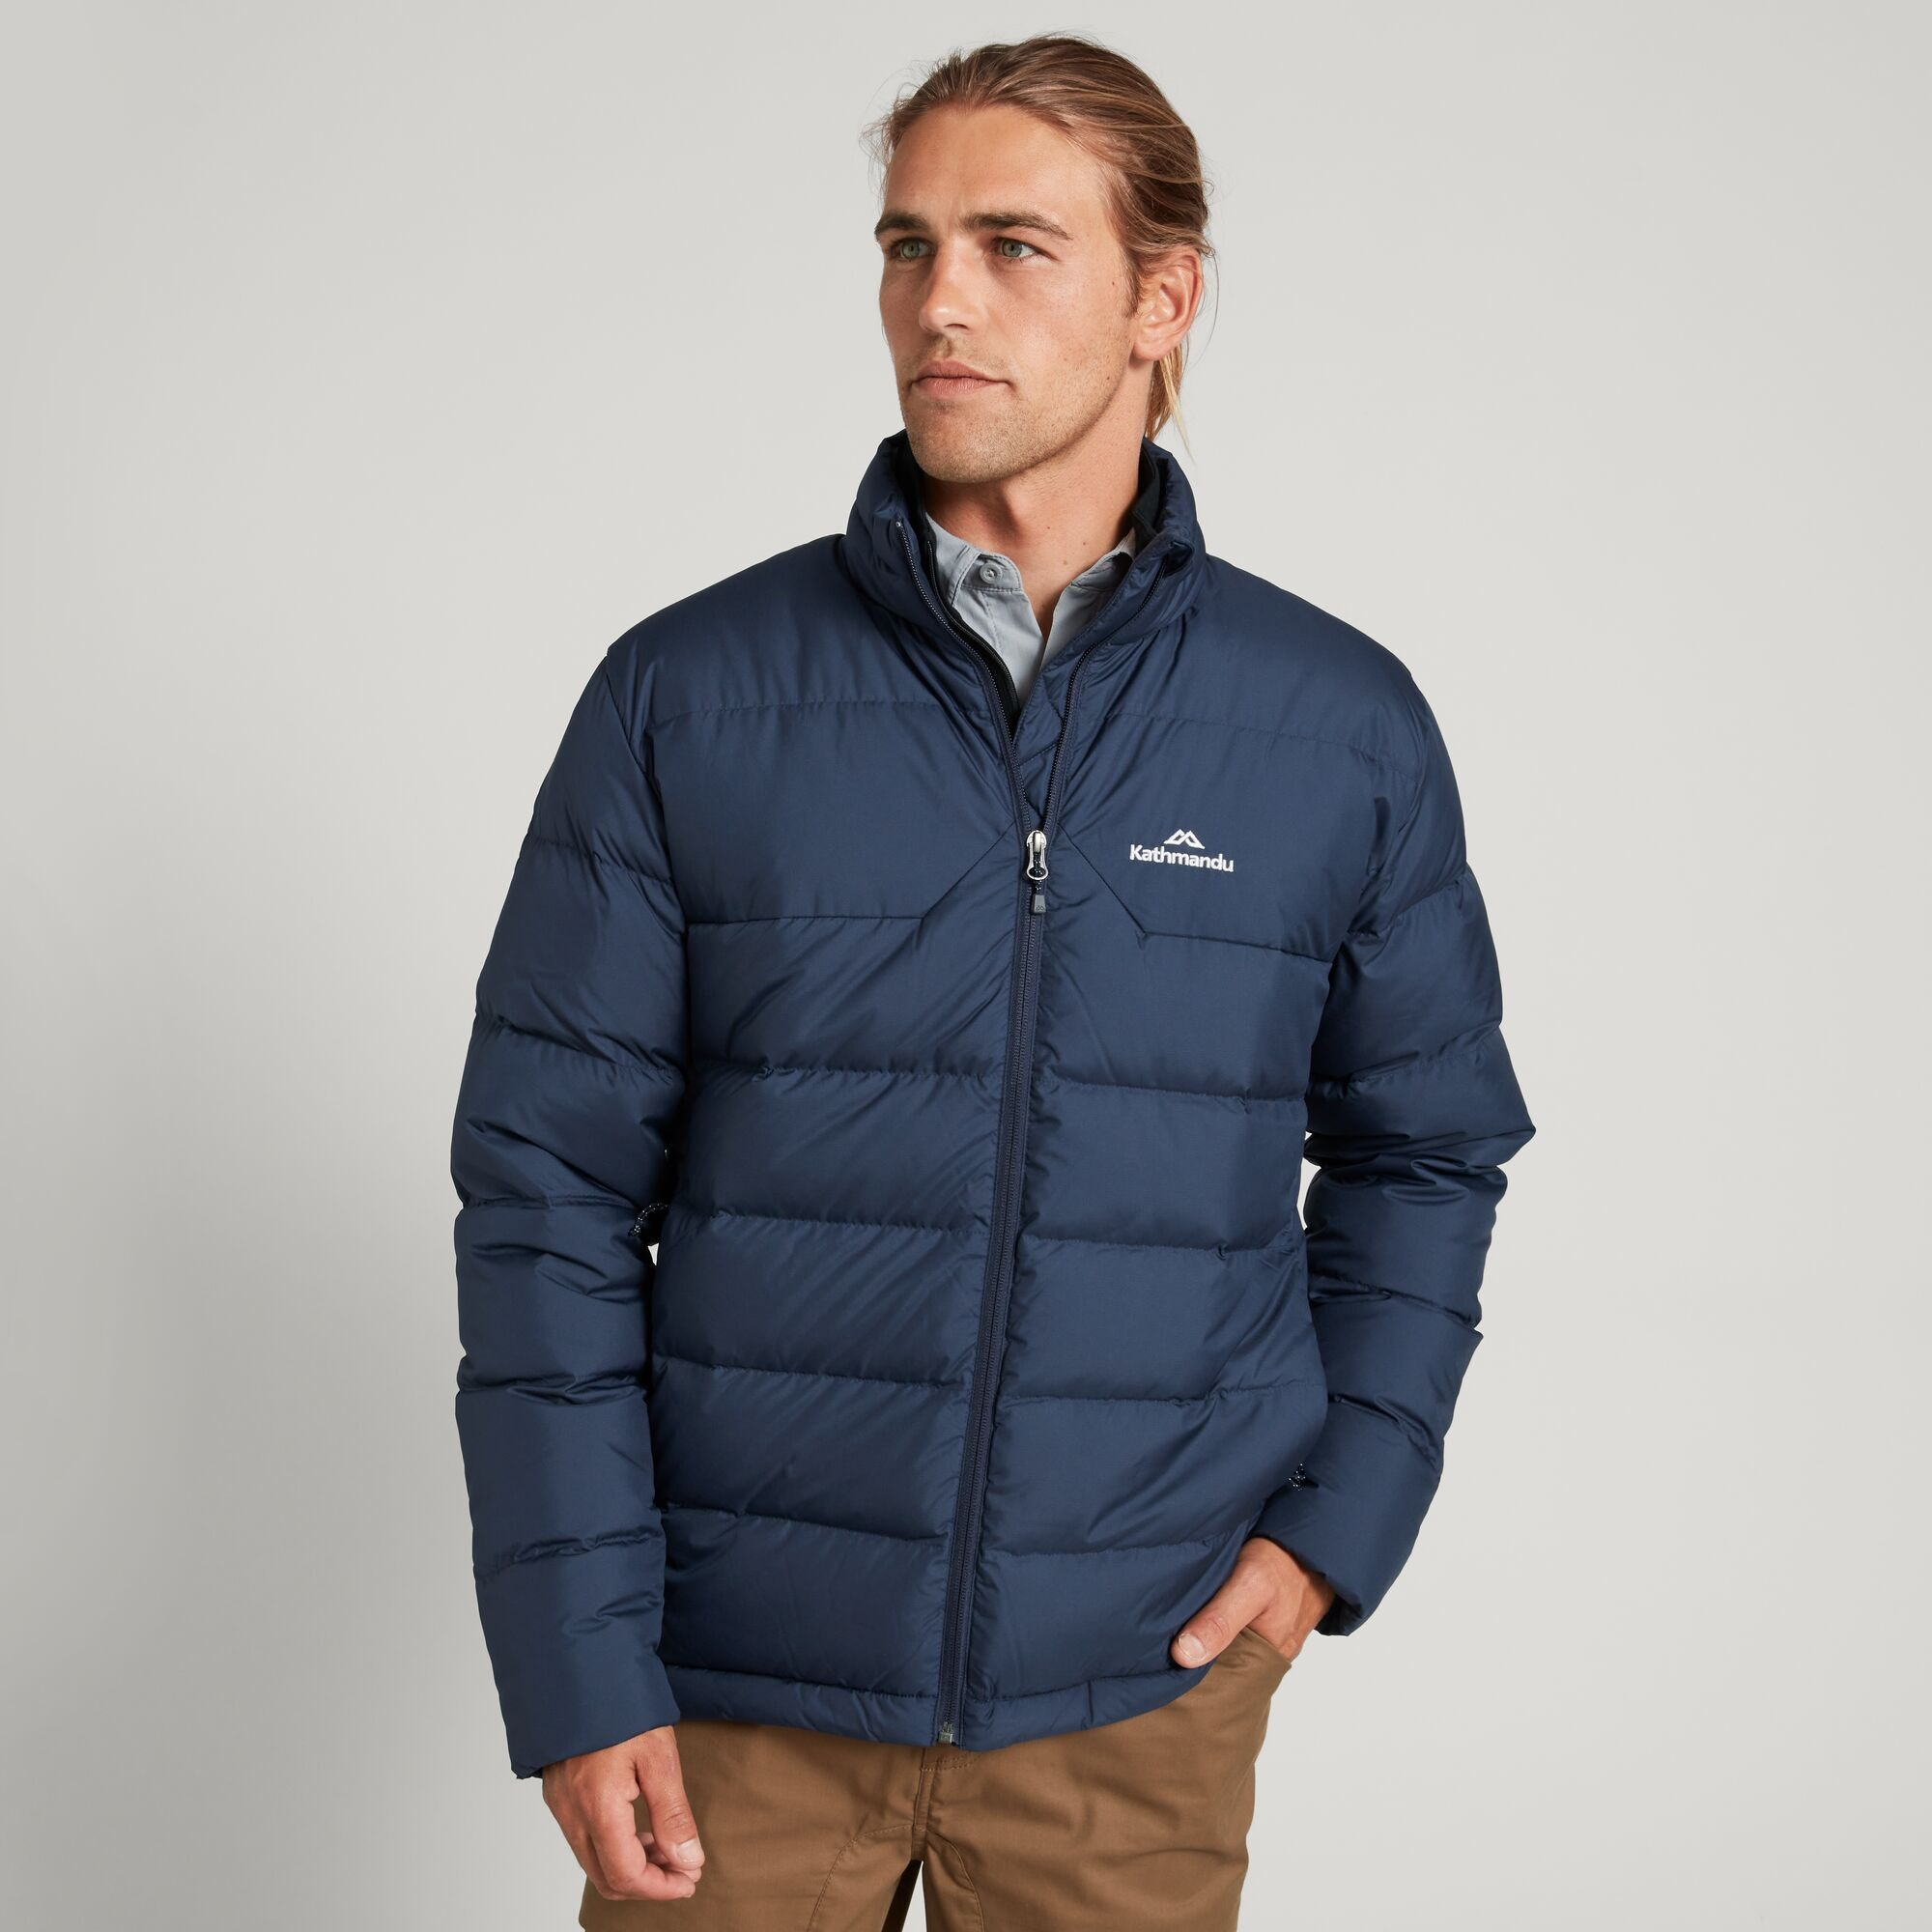 thumbnail 18 - NEW Kathmandu Epiq Mens 600 Fill Down Puffer Warm Outdoor Winter Jacket